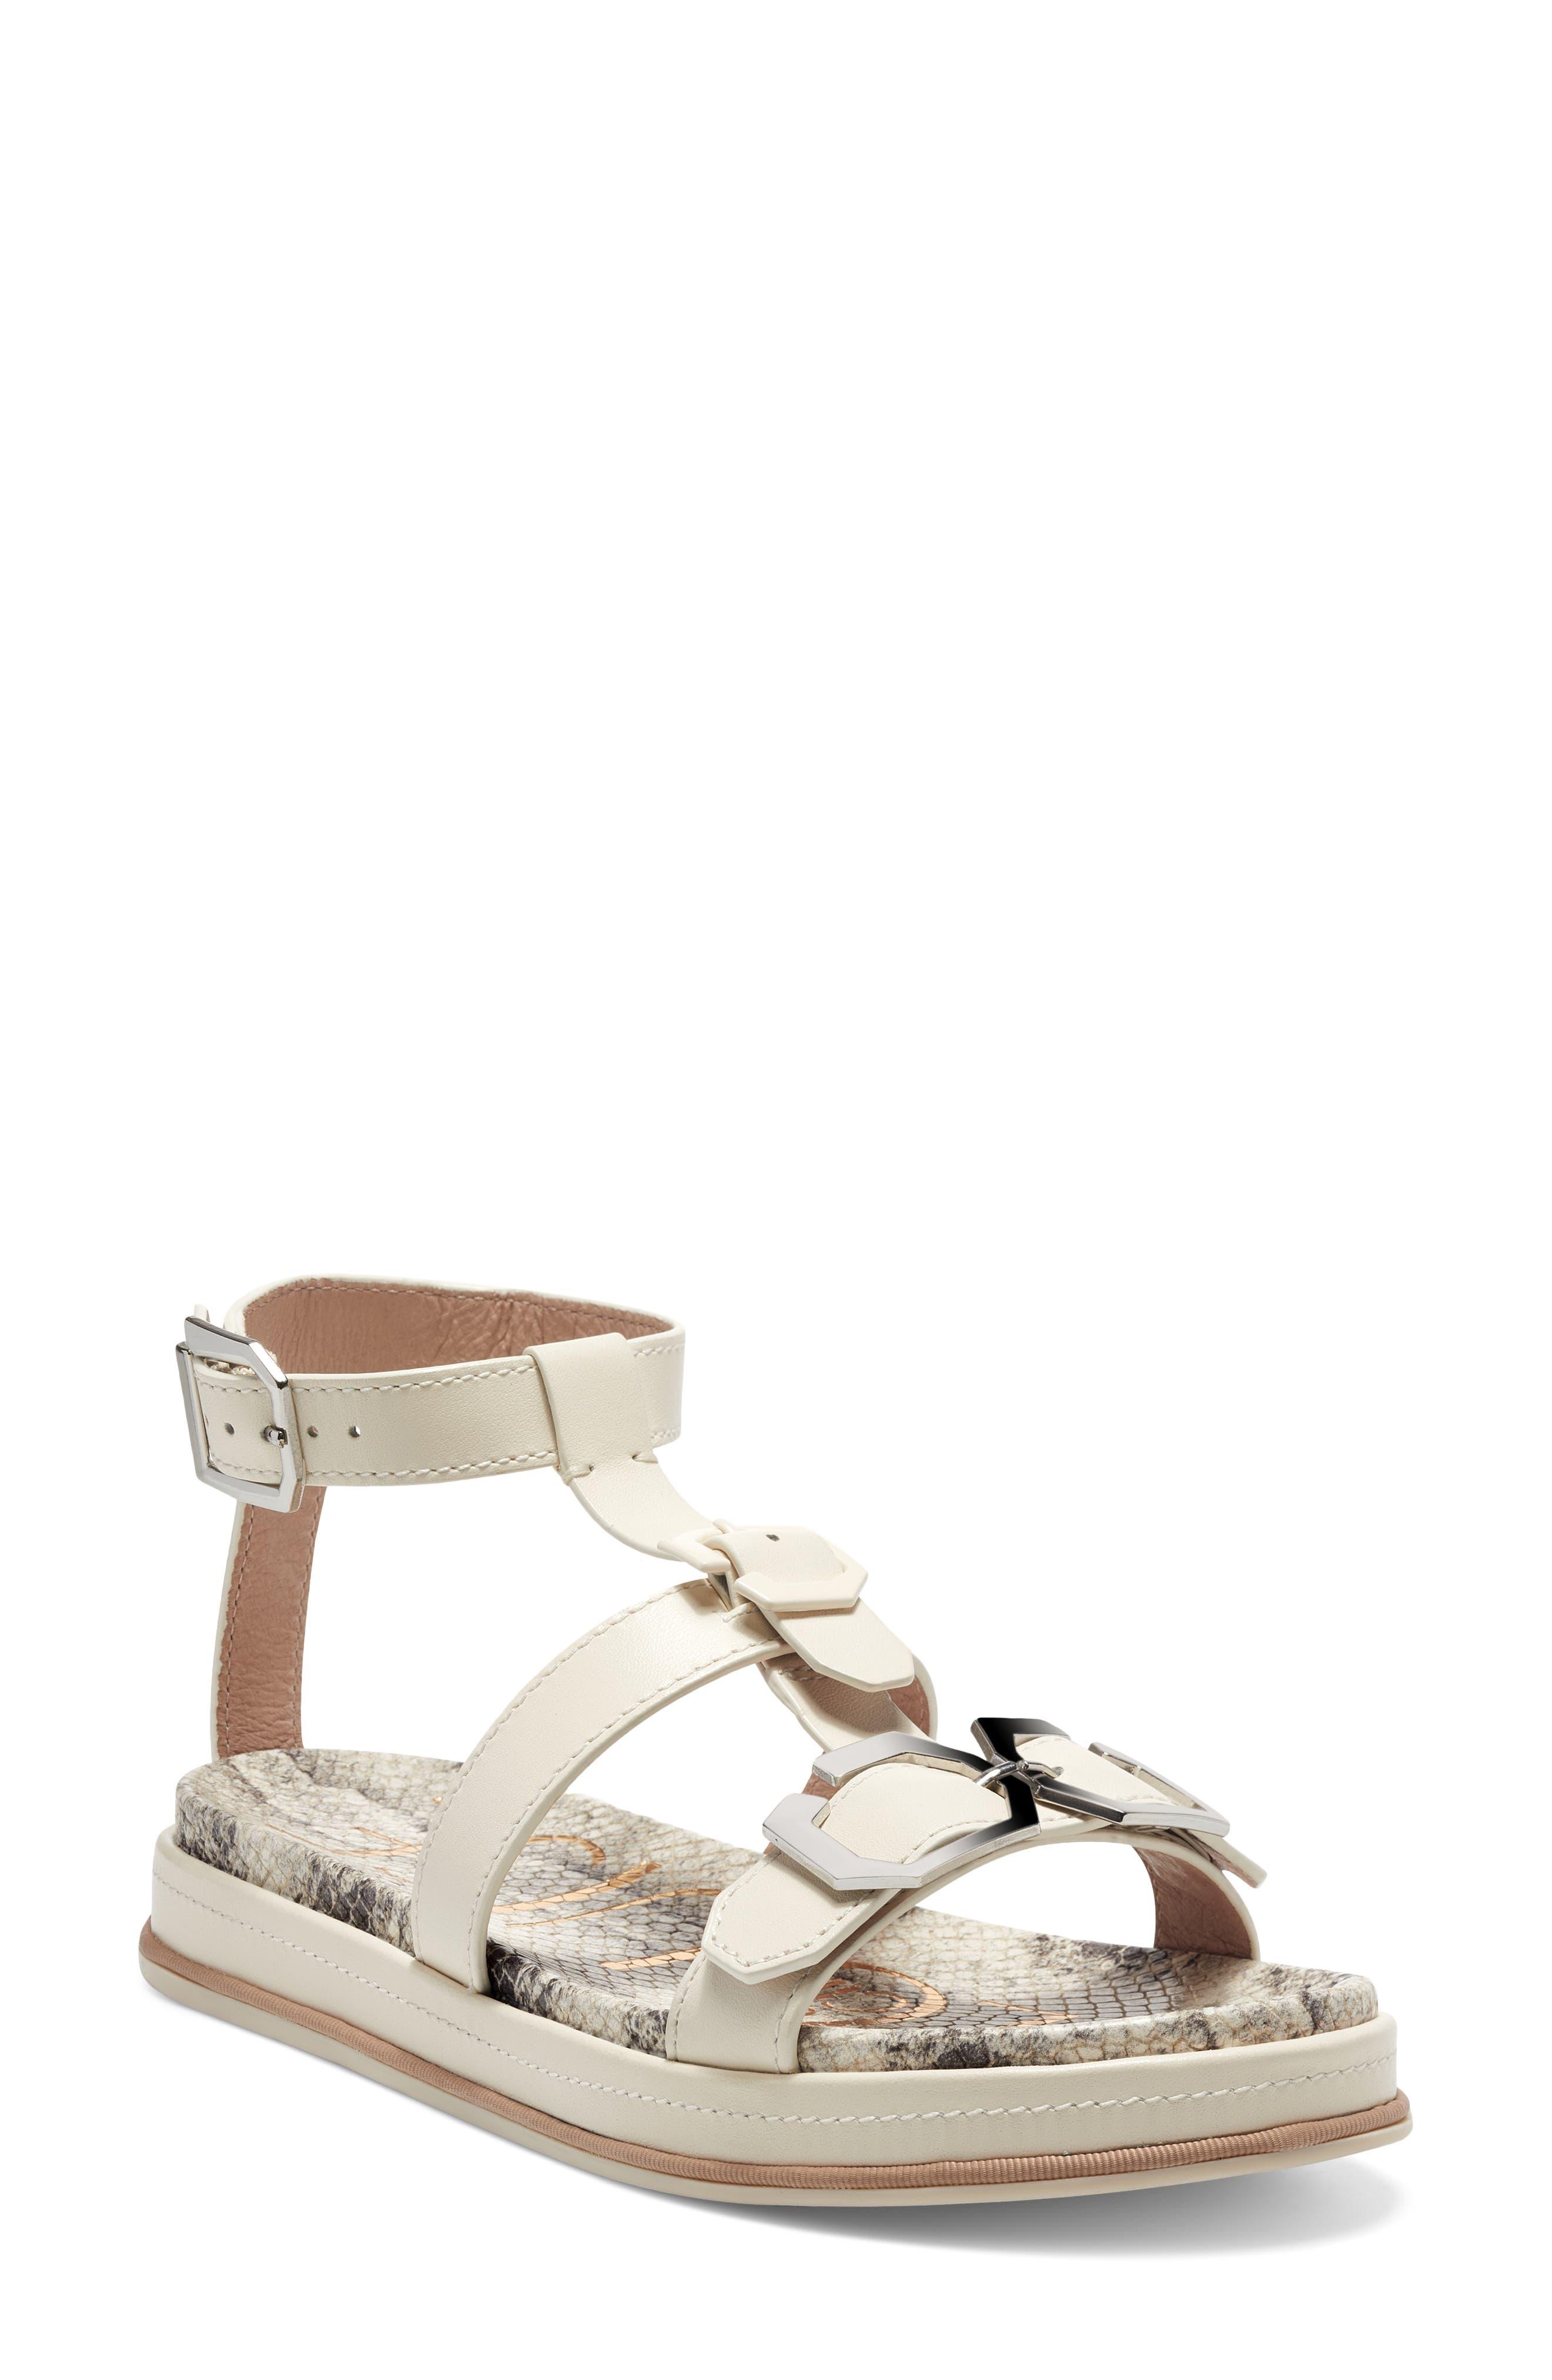 Aventi Gladiator Sandal